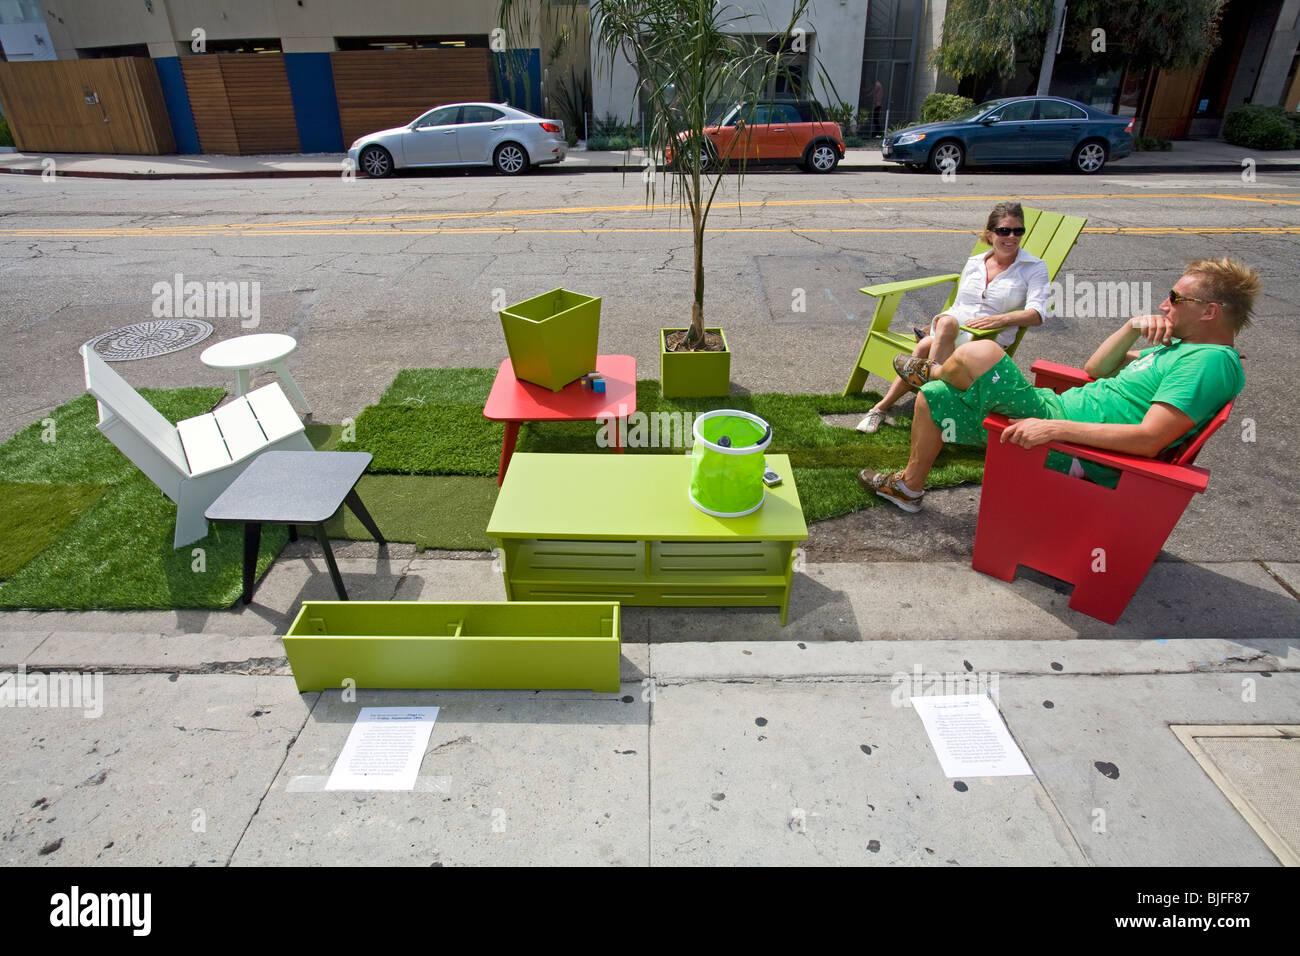 Dritte jährliche Park [Ing] Tag LA, Abbot Kinney Blvd, Venice, Los Angeles, Kalifornien Stockbild